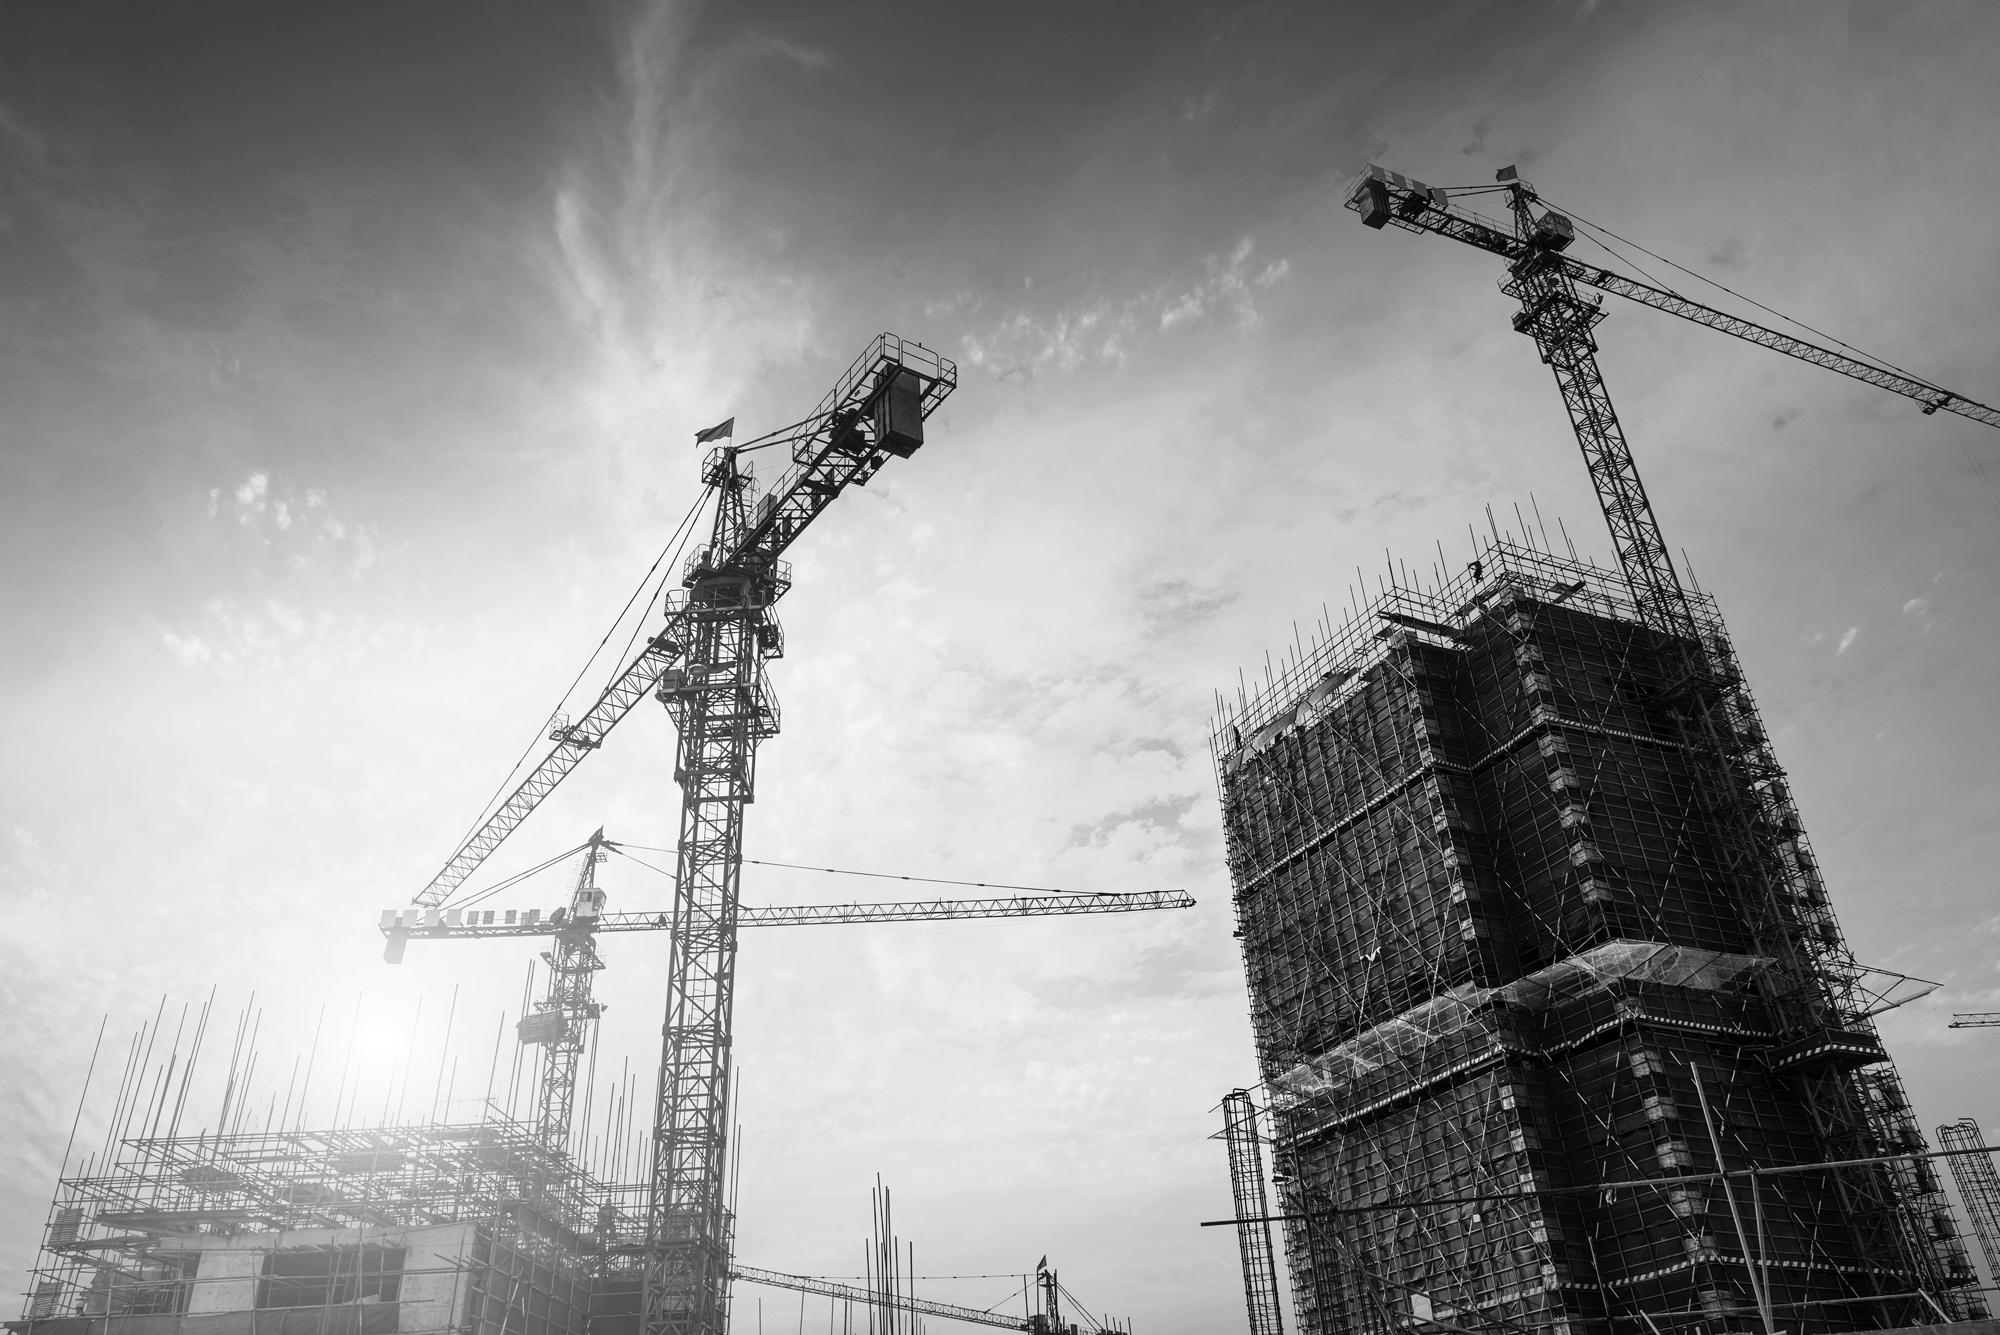 construction_shutterstock_223248622.png